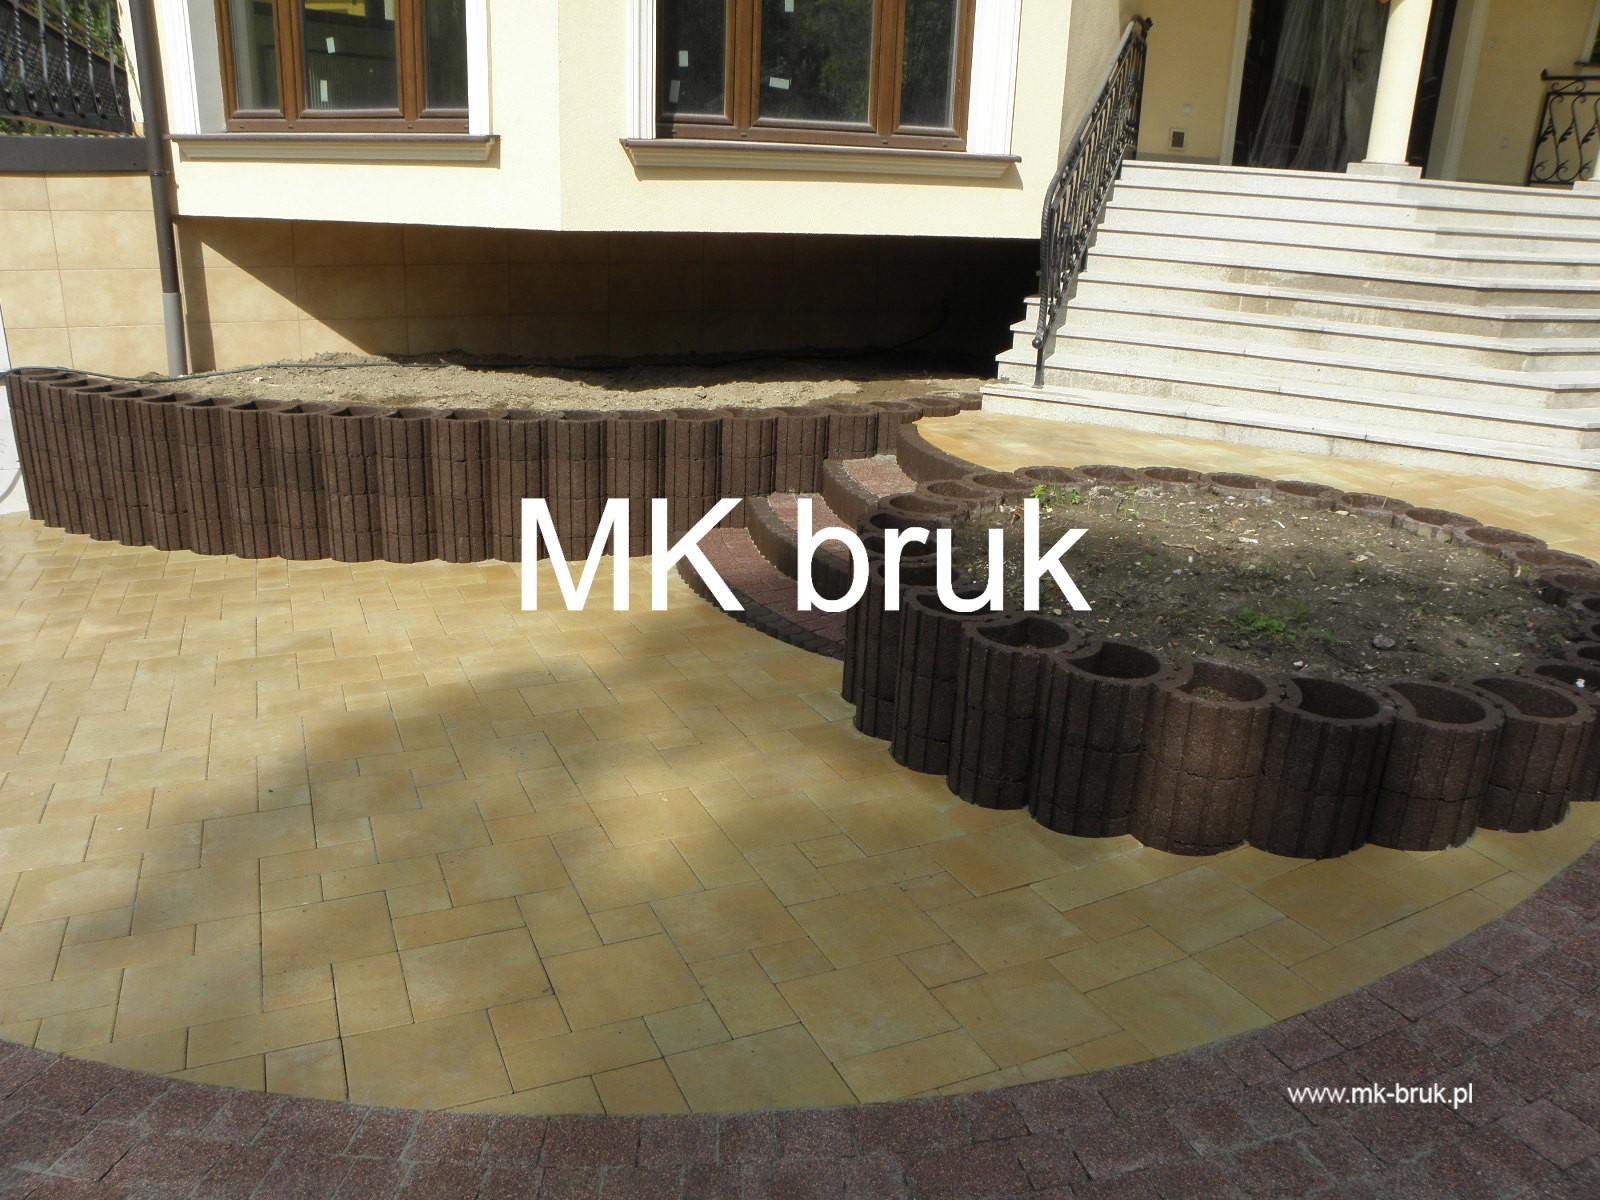 kostka brukowa Kraków - MK BRUK